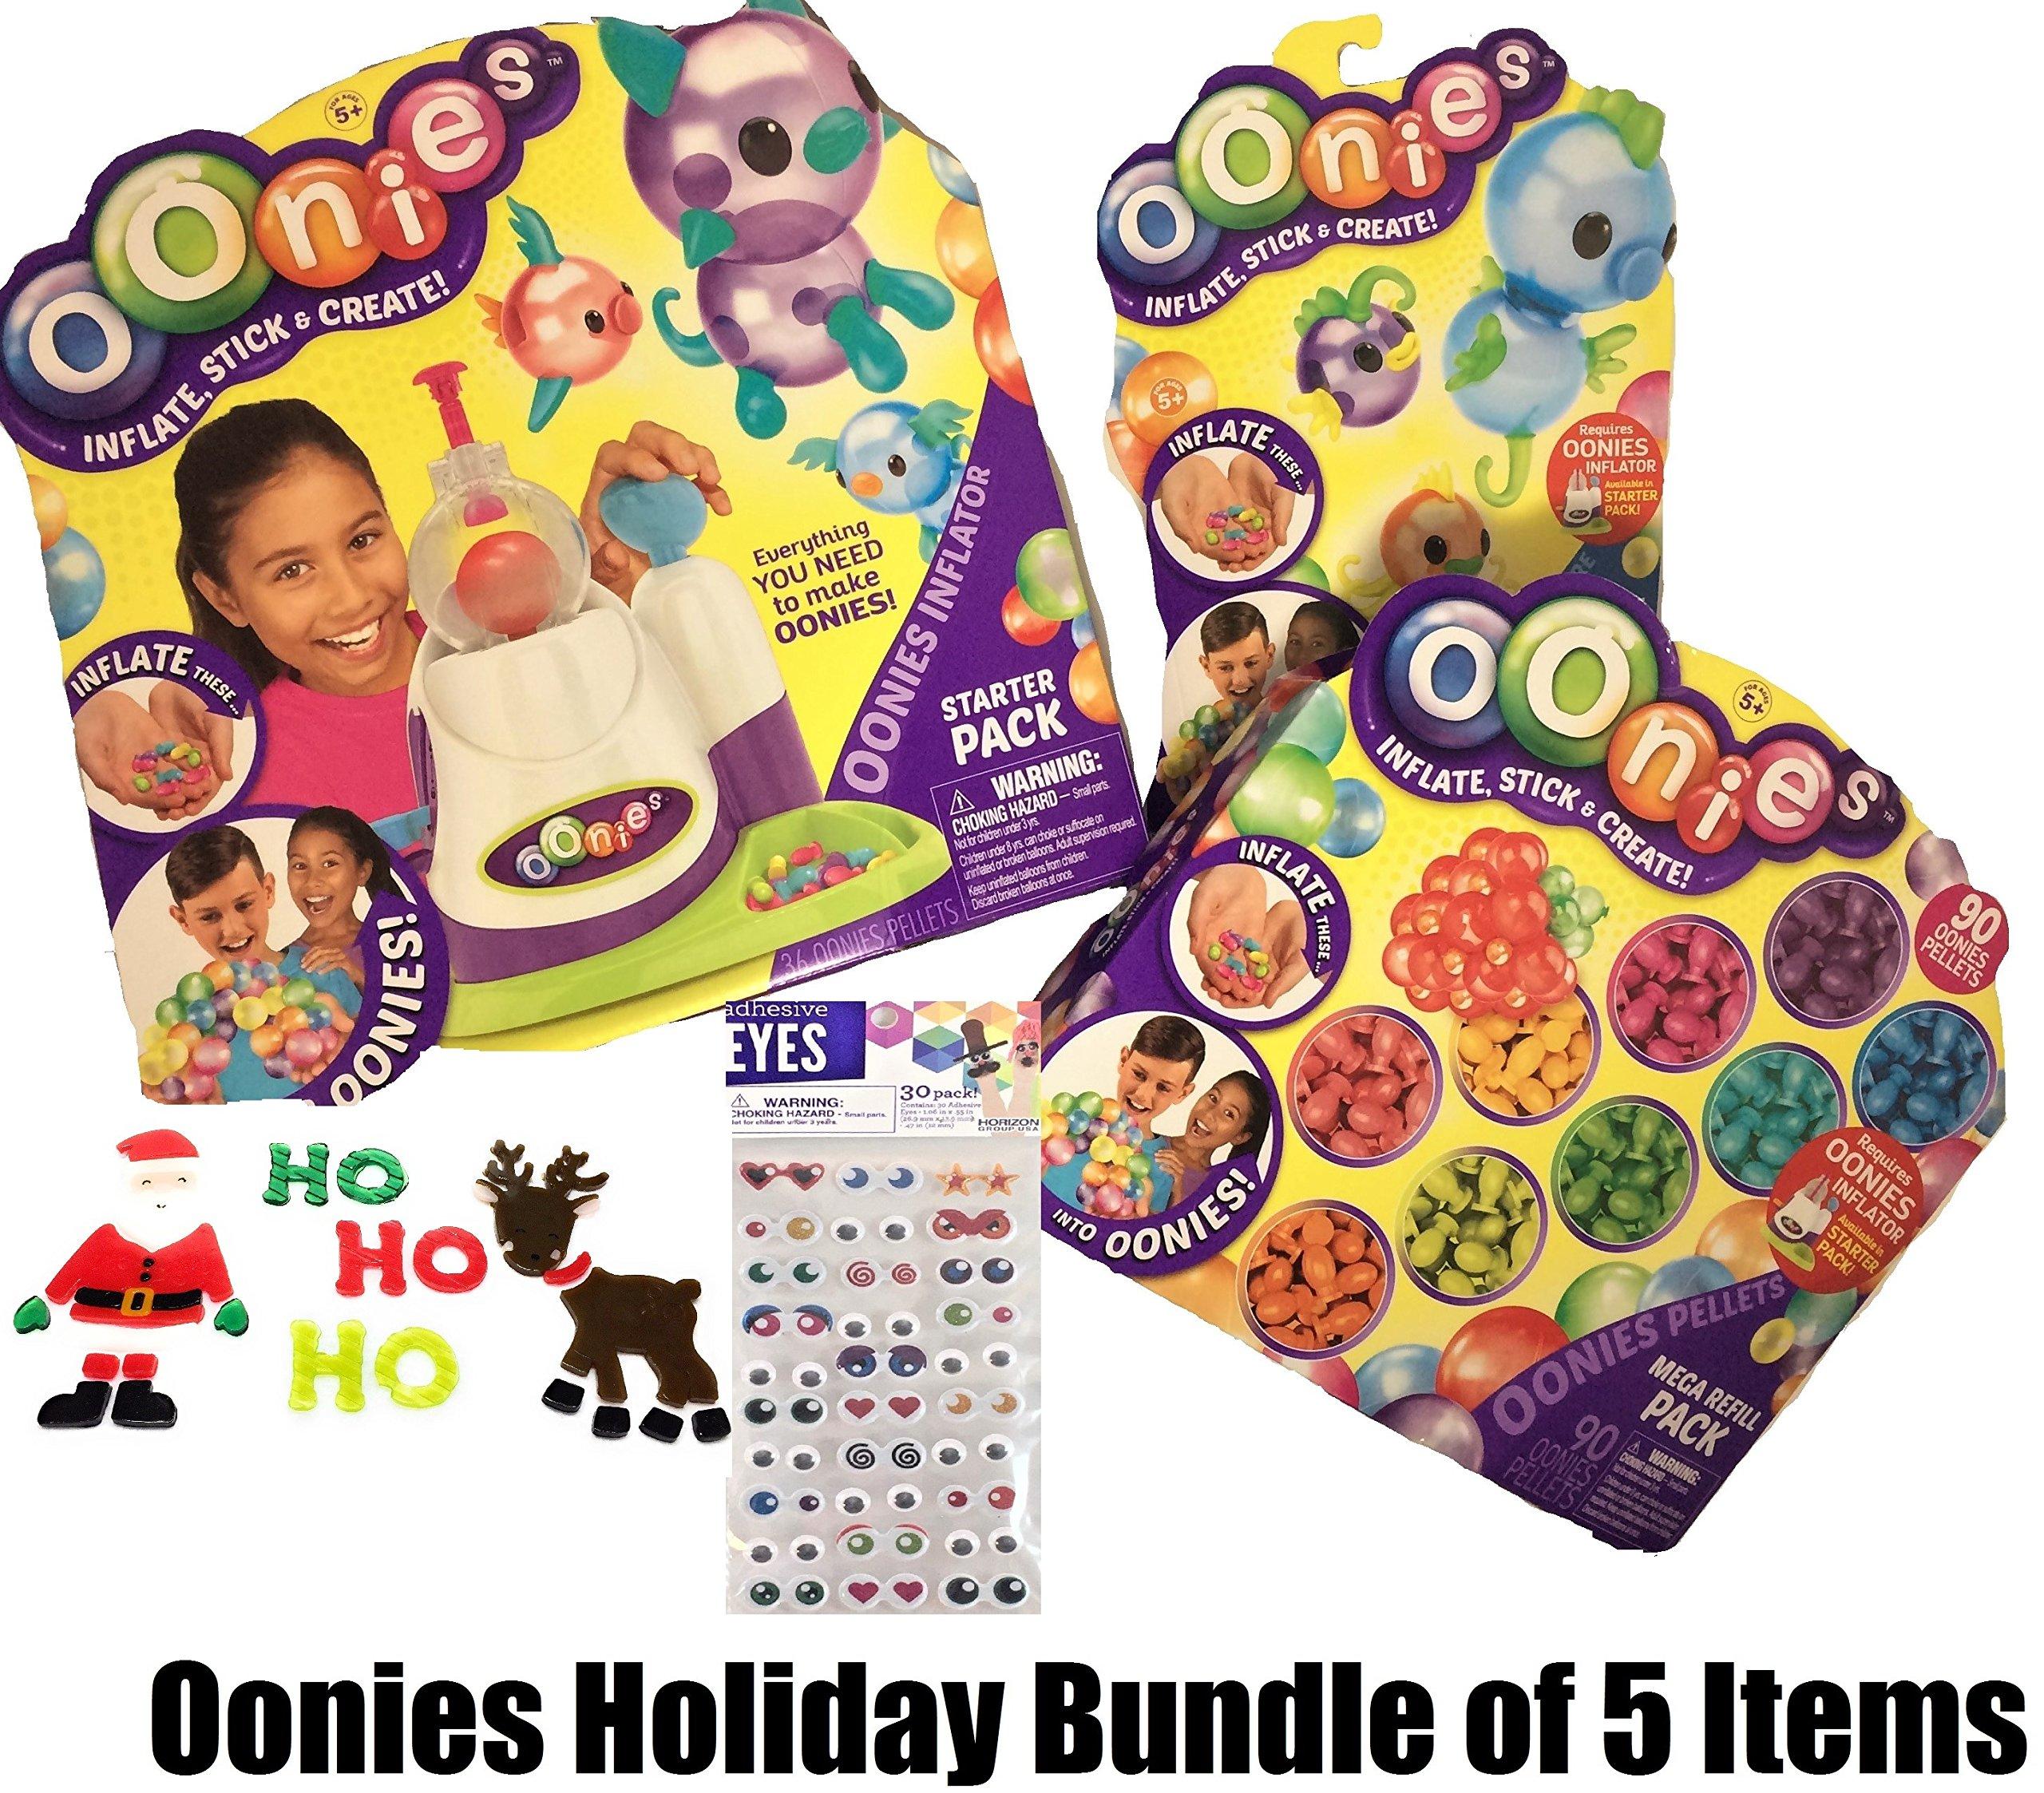 Oonies 5 Piece Toy Bundle Includes Starter Pack with Inflator Tool, Oonies MEGA Refill Multicolor Pack, Oonies Additional Theme Pack, 30 Puffy Sticker Adhesive Eyes & Santa Clings